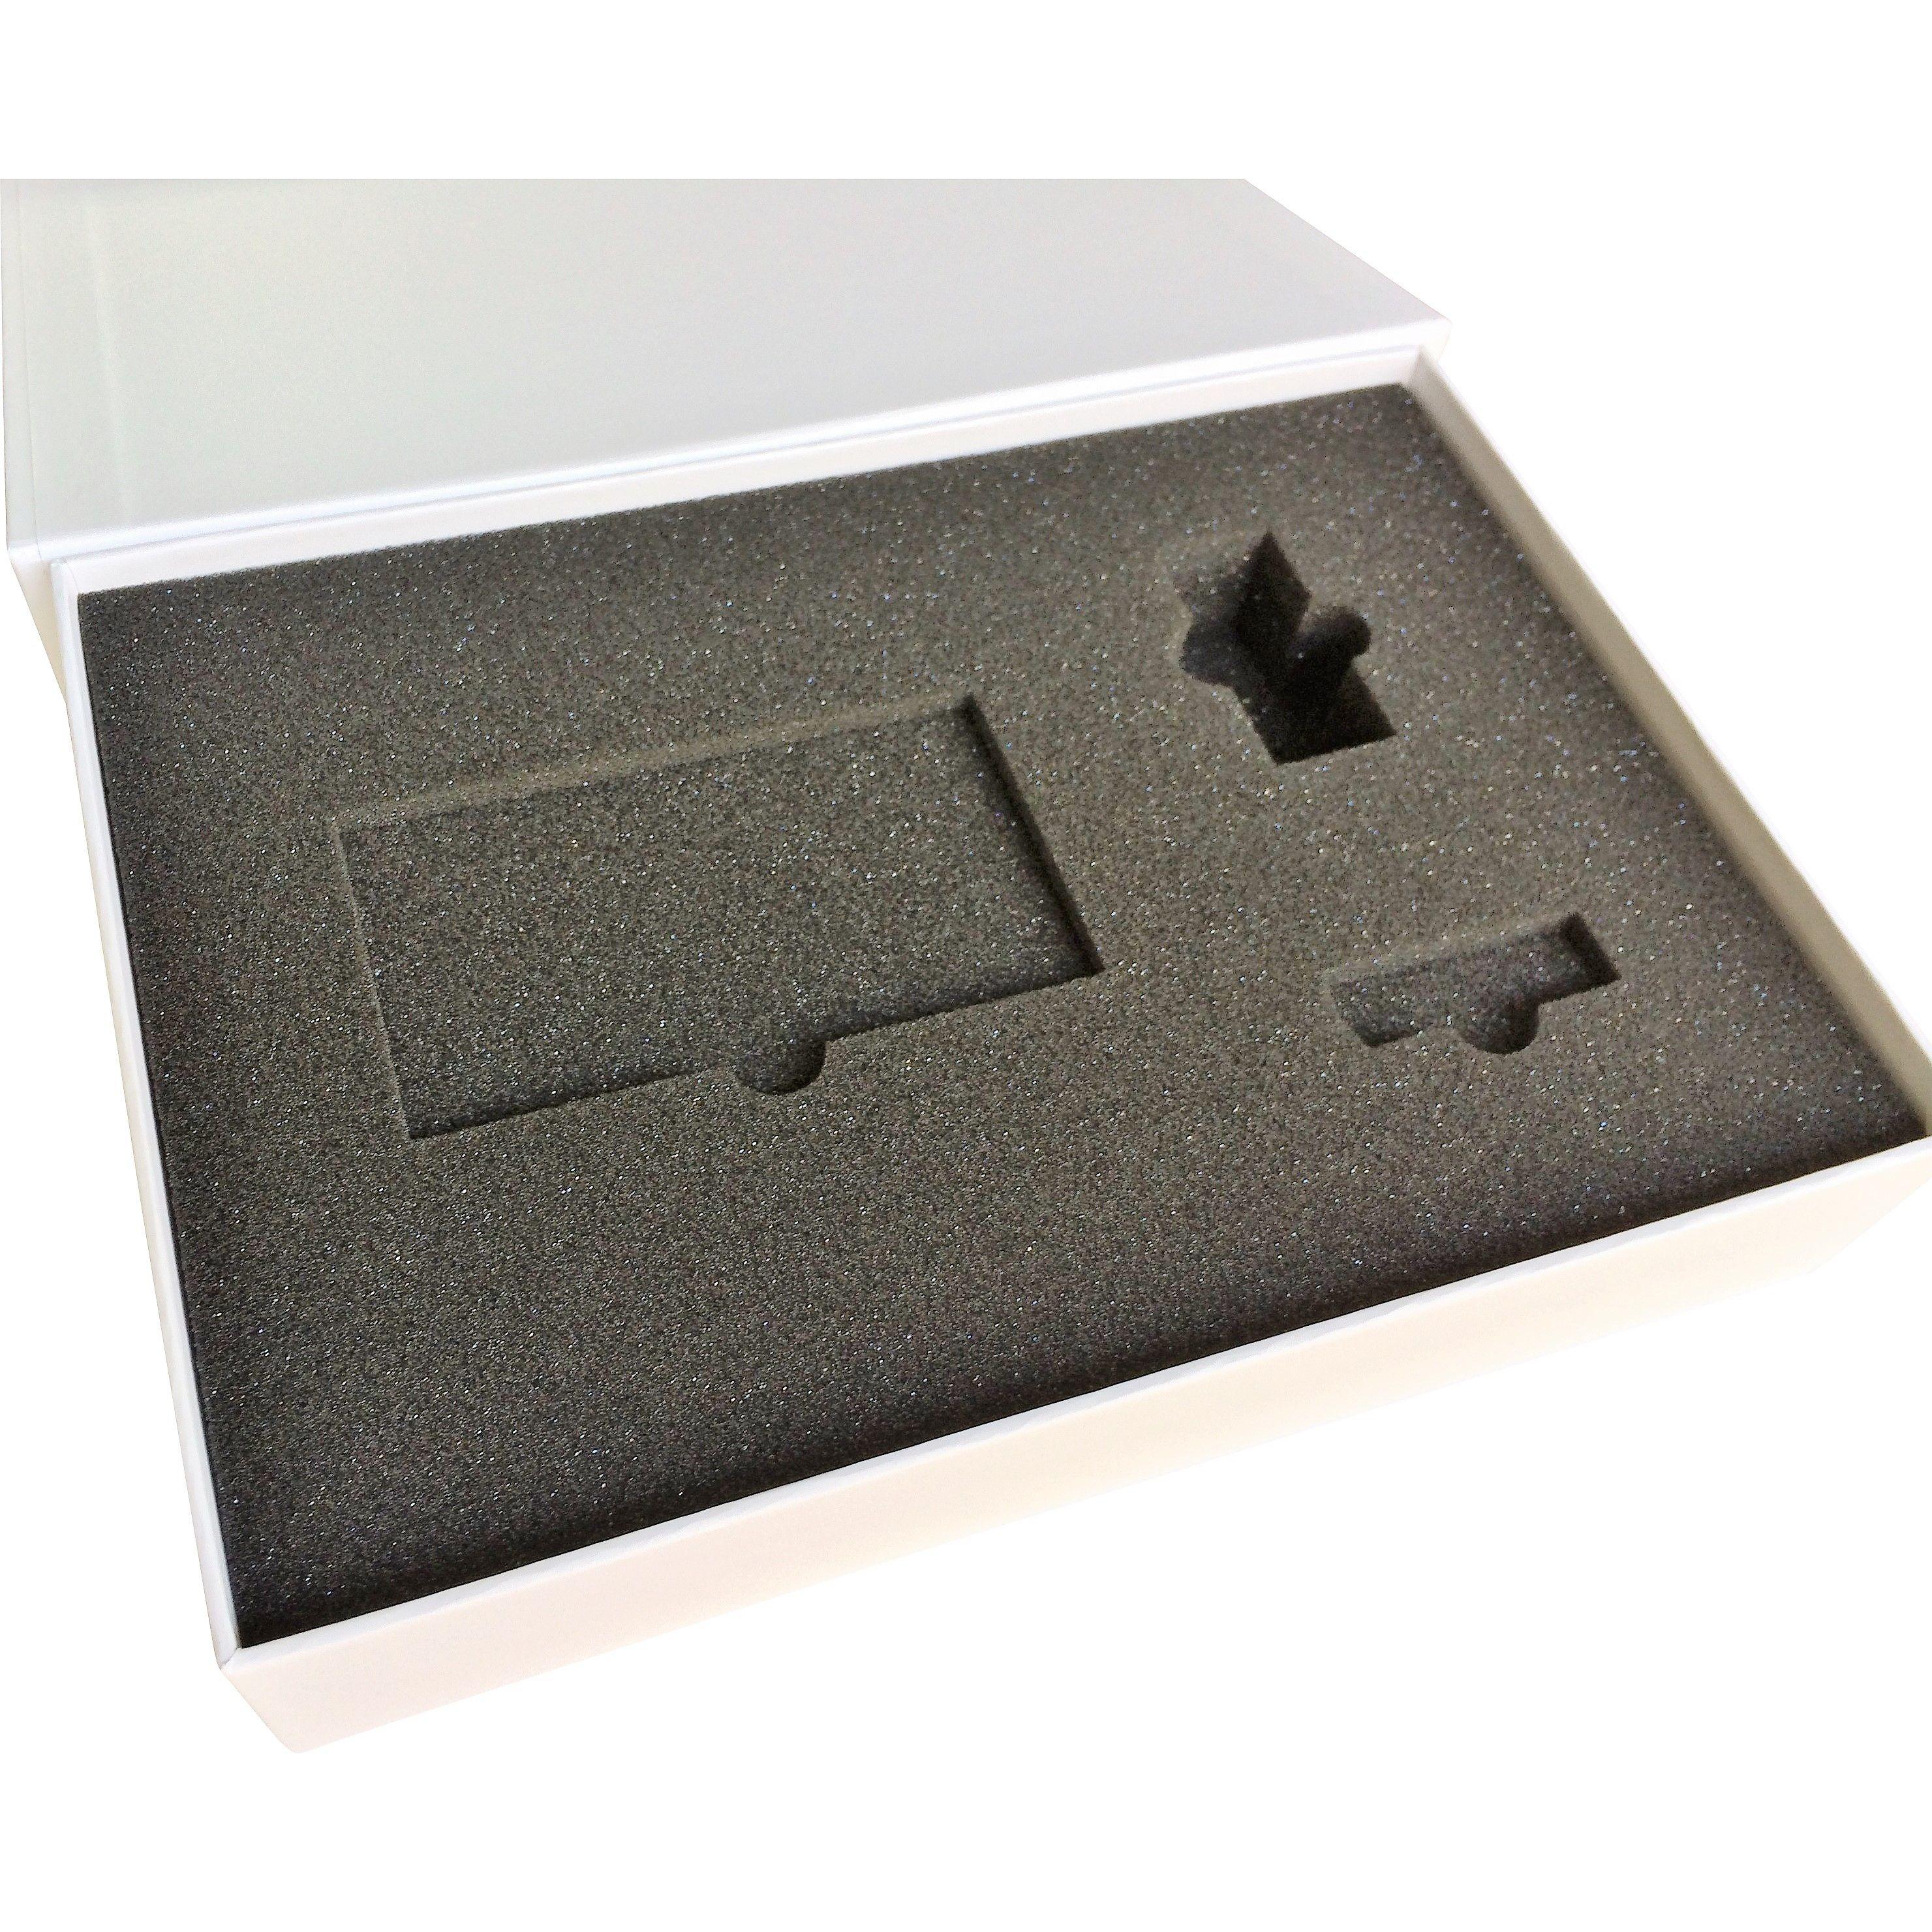 rigid box with cut black foam insert for marketing promotion